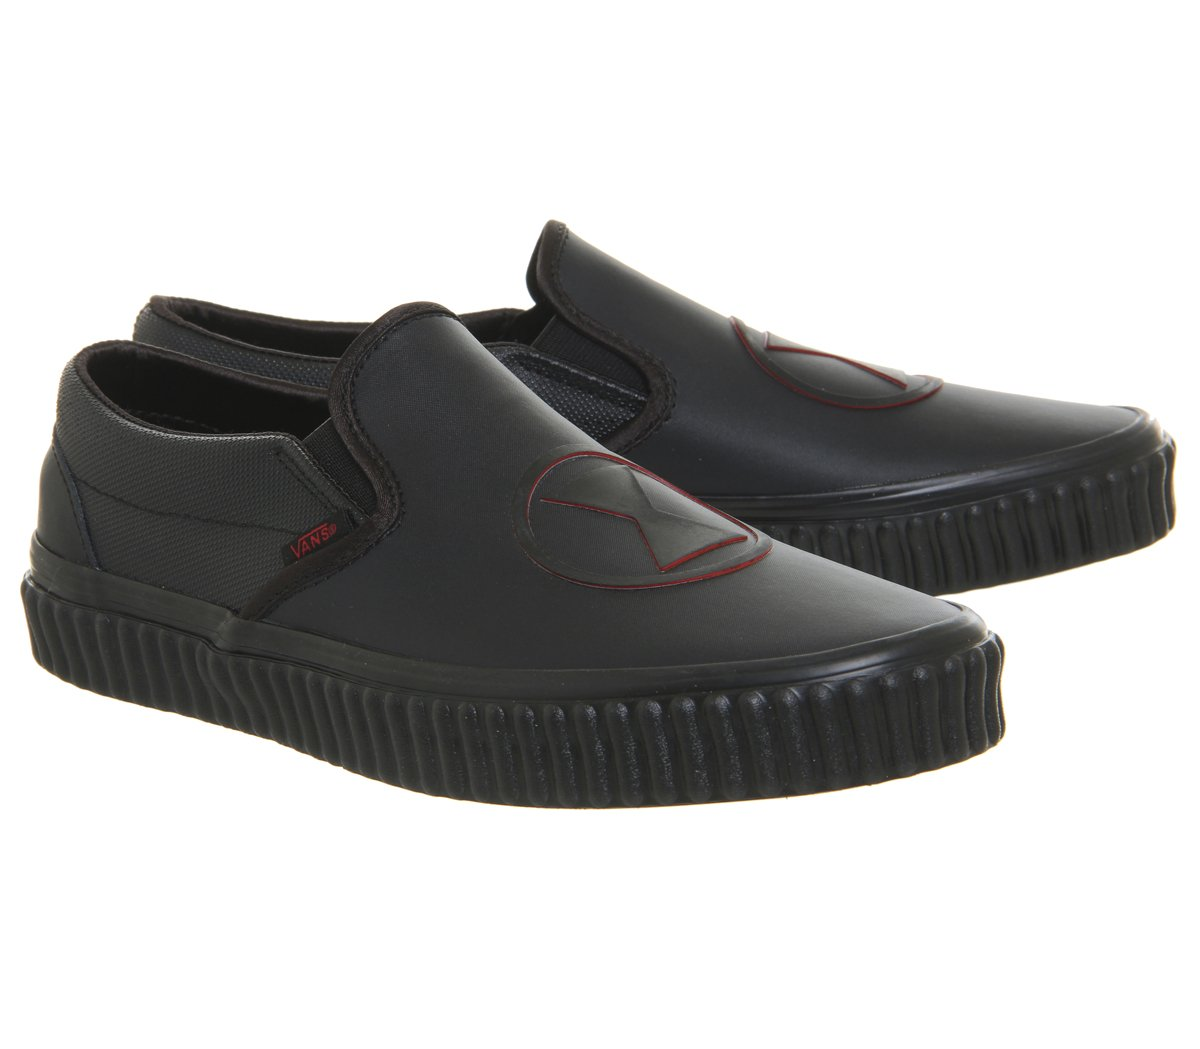 Vans Unisex Classic (Checkerboard) Slip-On Skate Shoe Women B0784XPSSJ 10 M US Women Shoe / 8.5 M US Men|(Marvel) Black Widow/Black 437c82